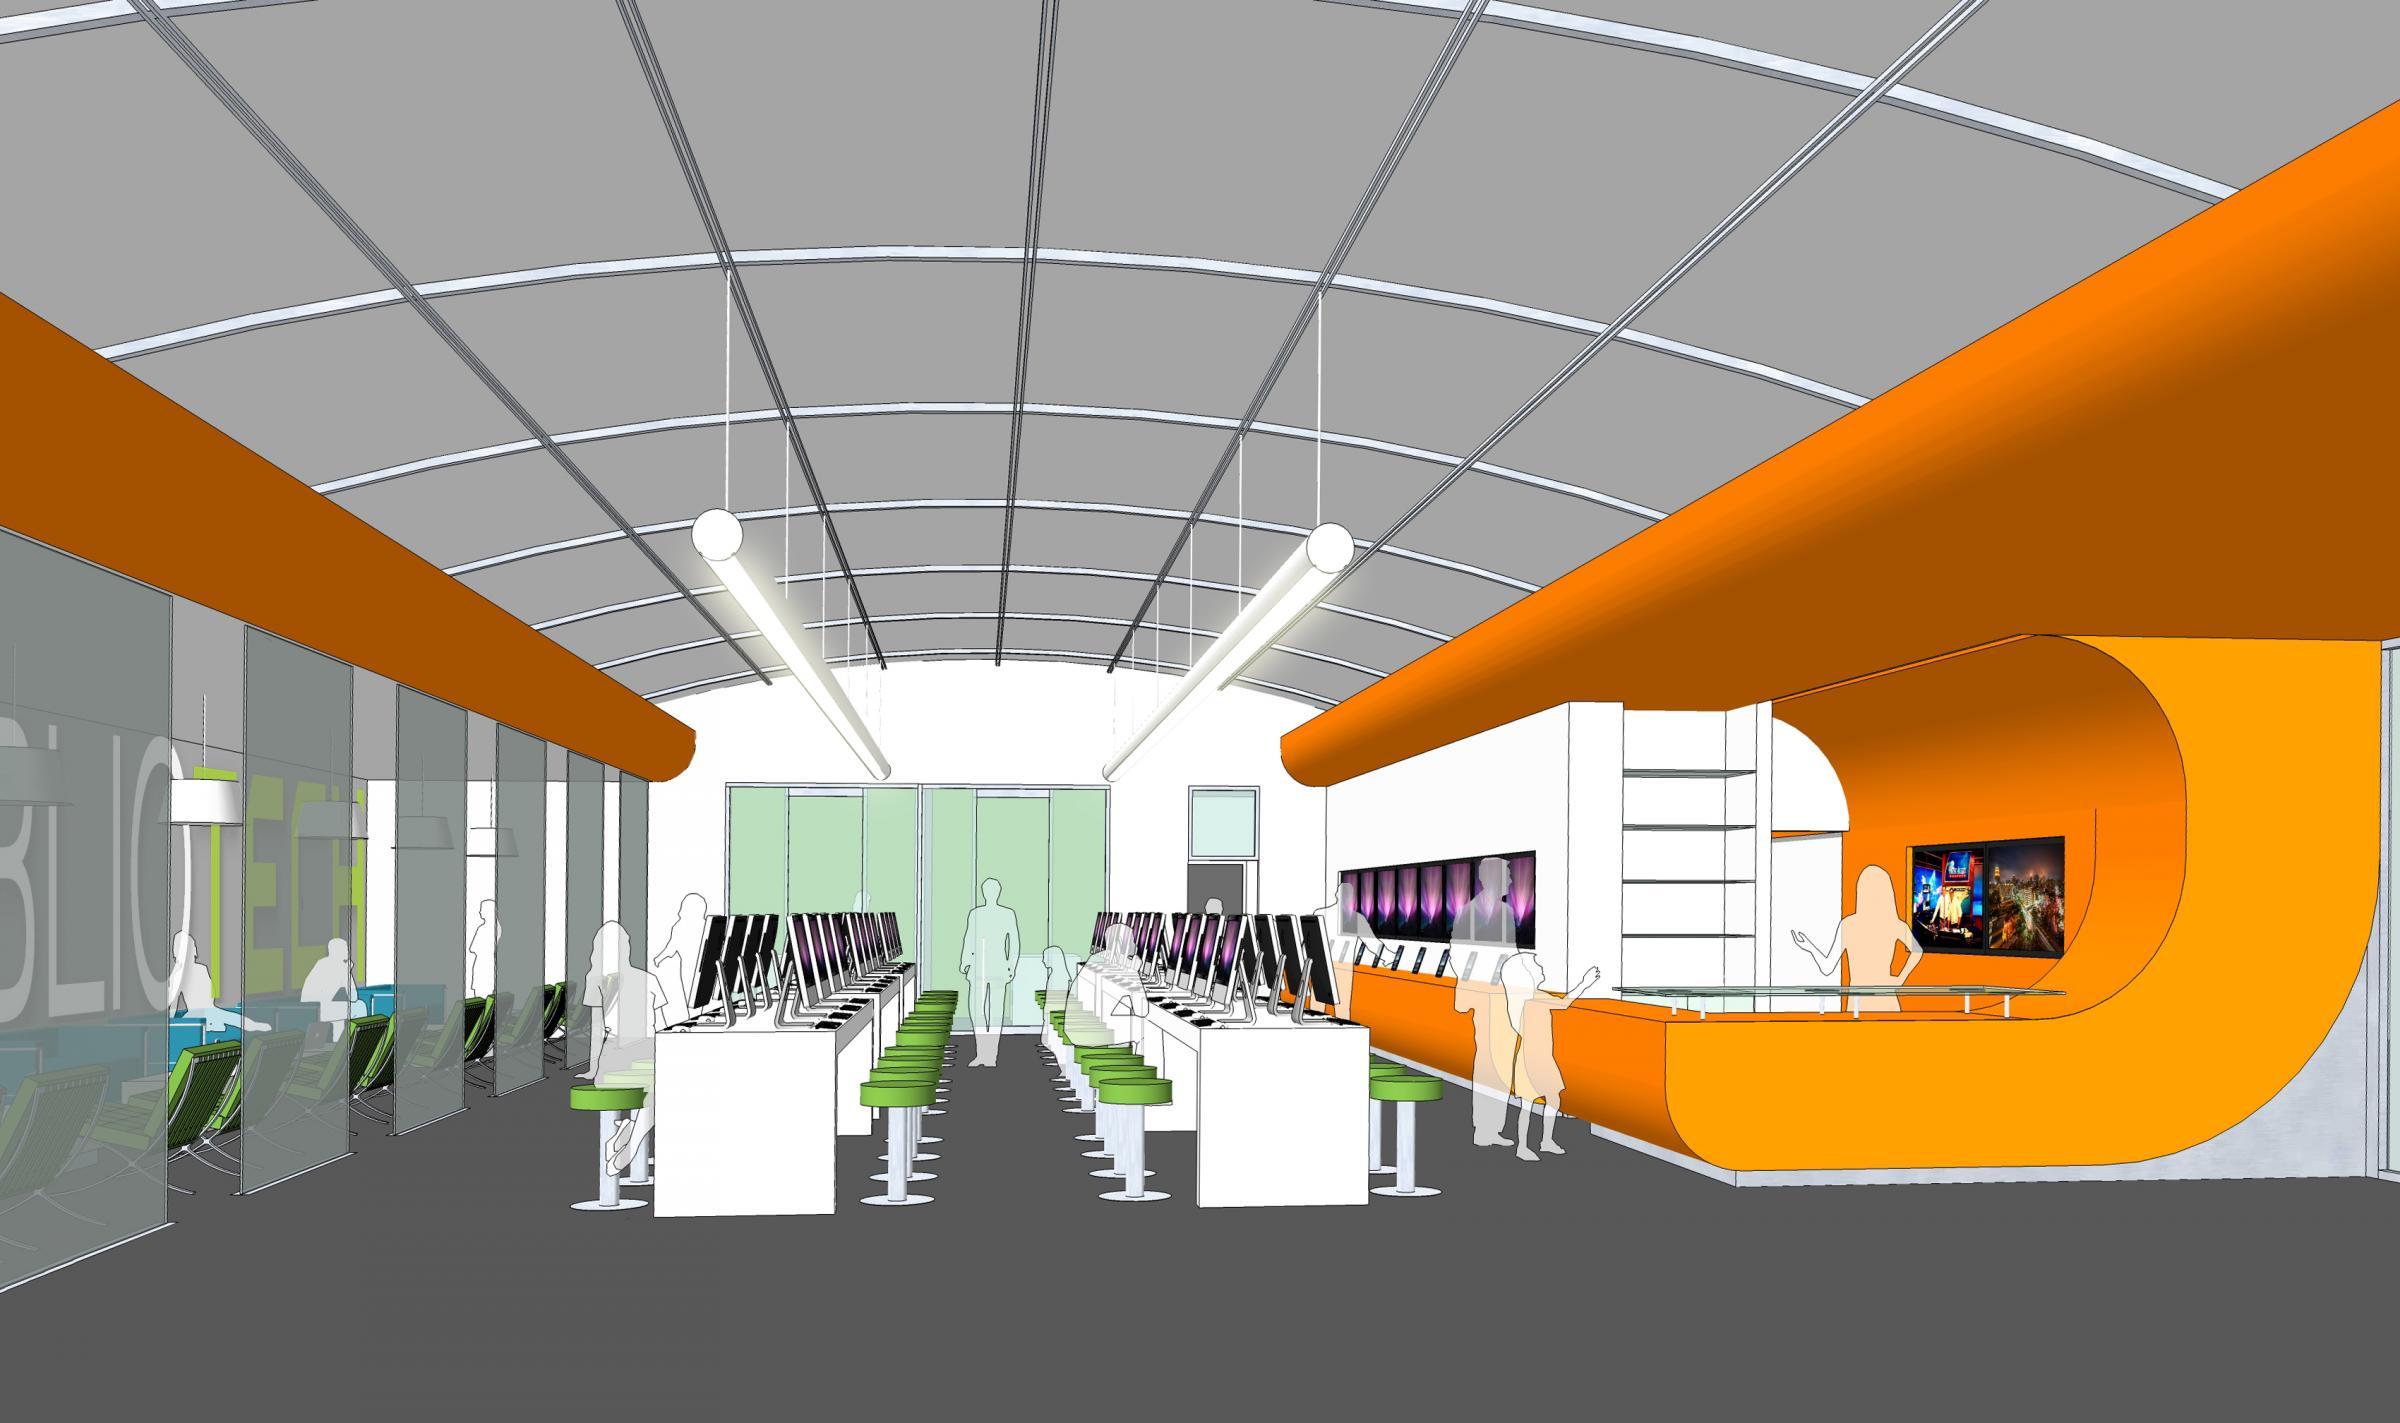 Concept Interior Design Of BiblioTech